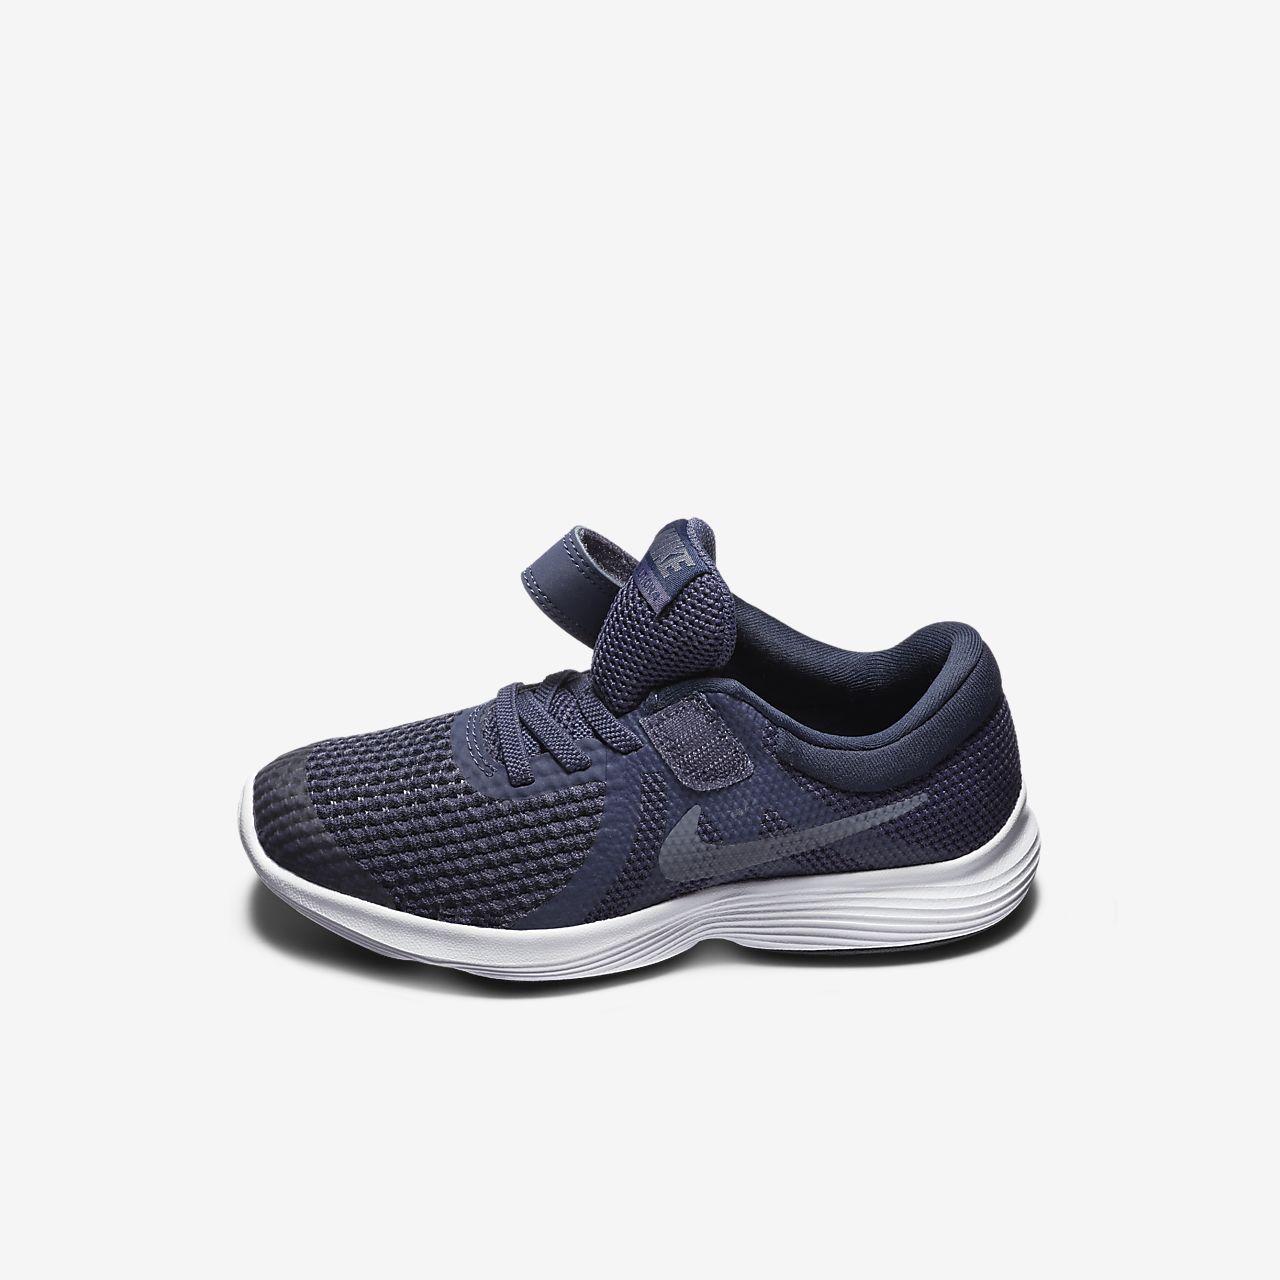 0344702c8932b Nike Revolution 4 Younger Kids  Shoe. Nike.com AU